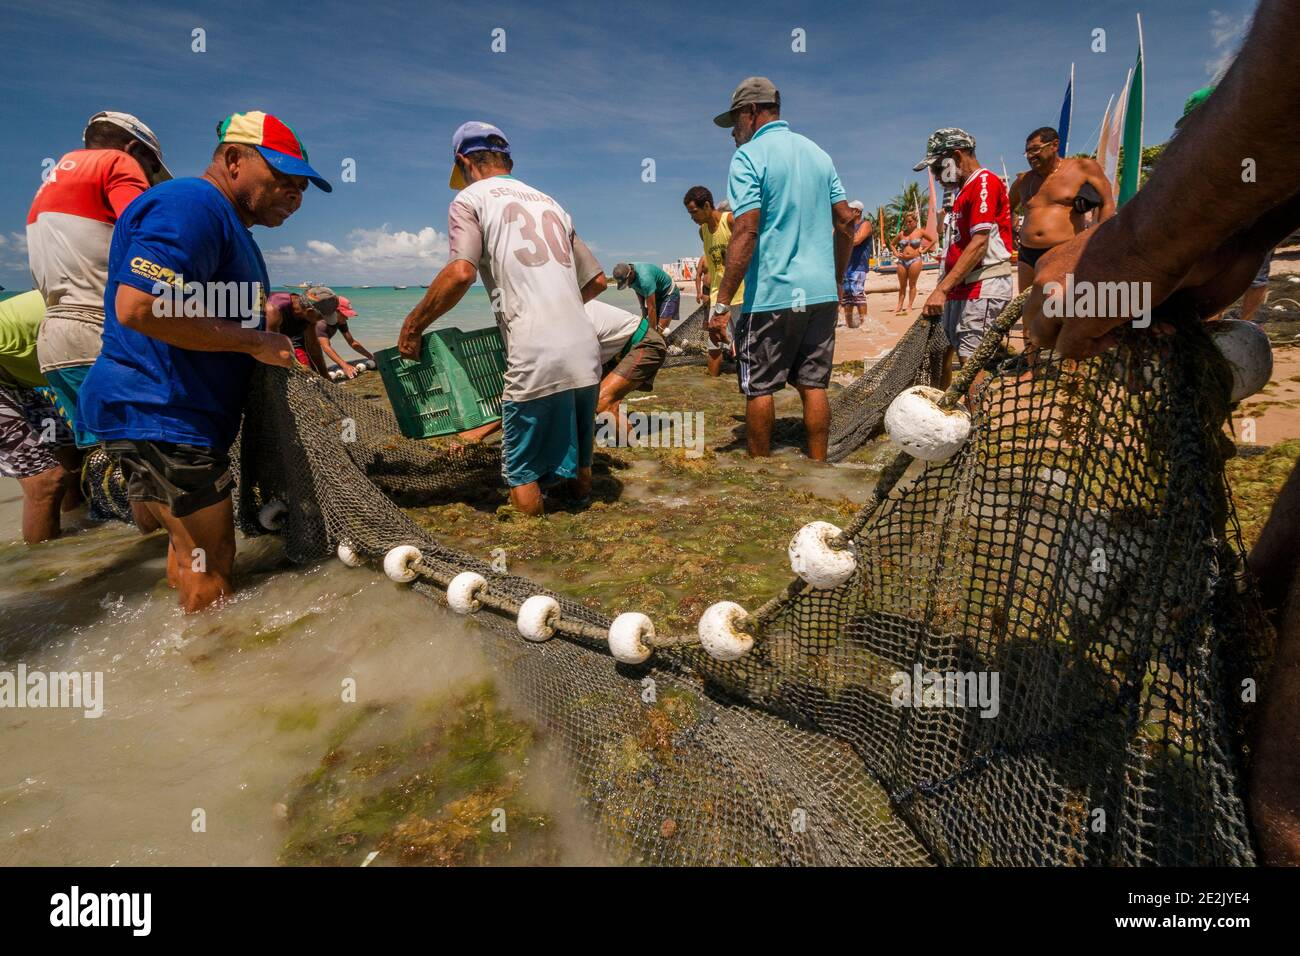 Fishermen working on a beach in Maceió, Brazil Stock Photo